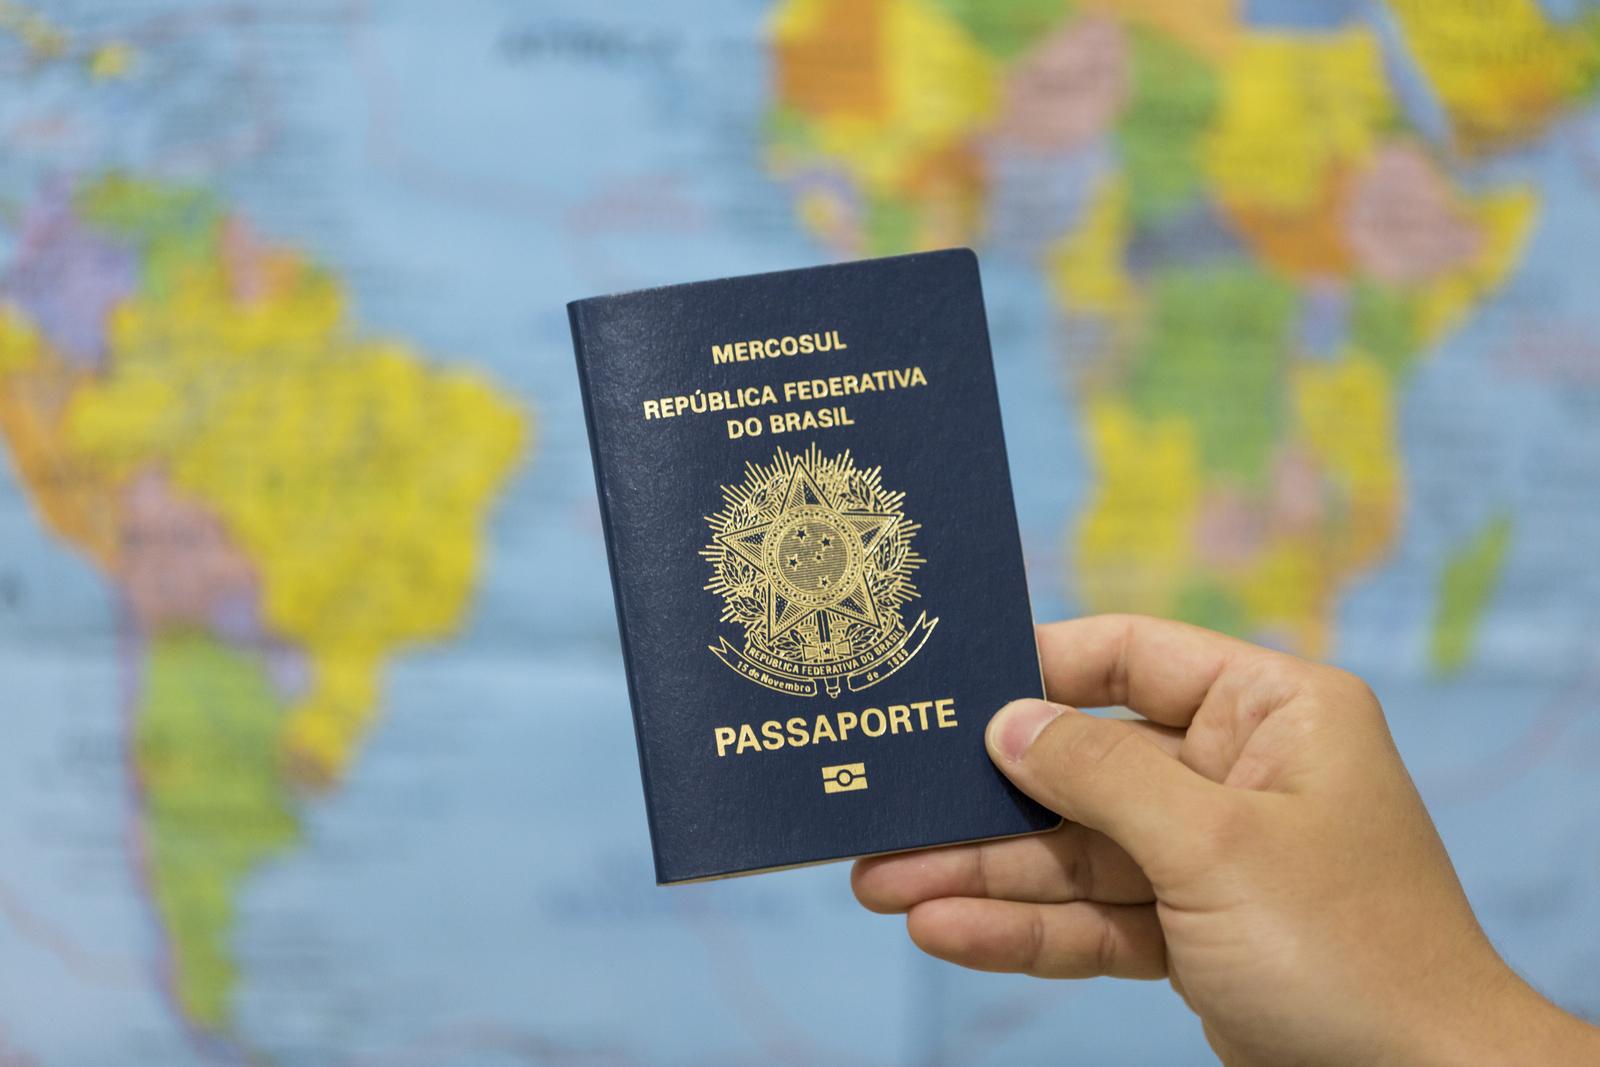 Renovar passaporte